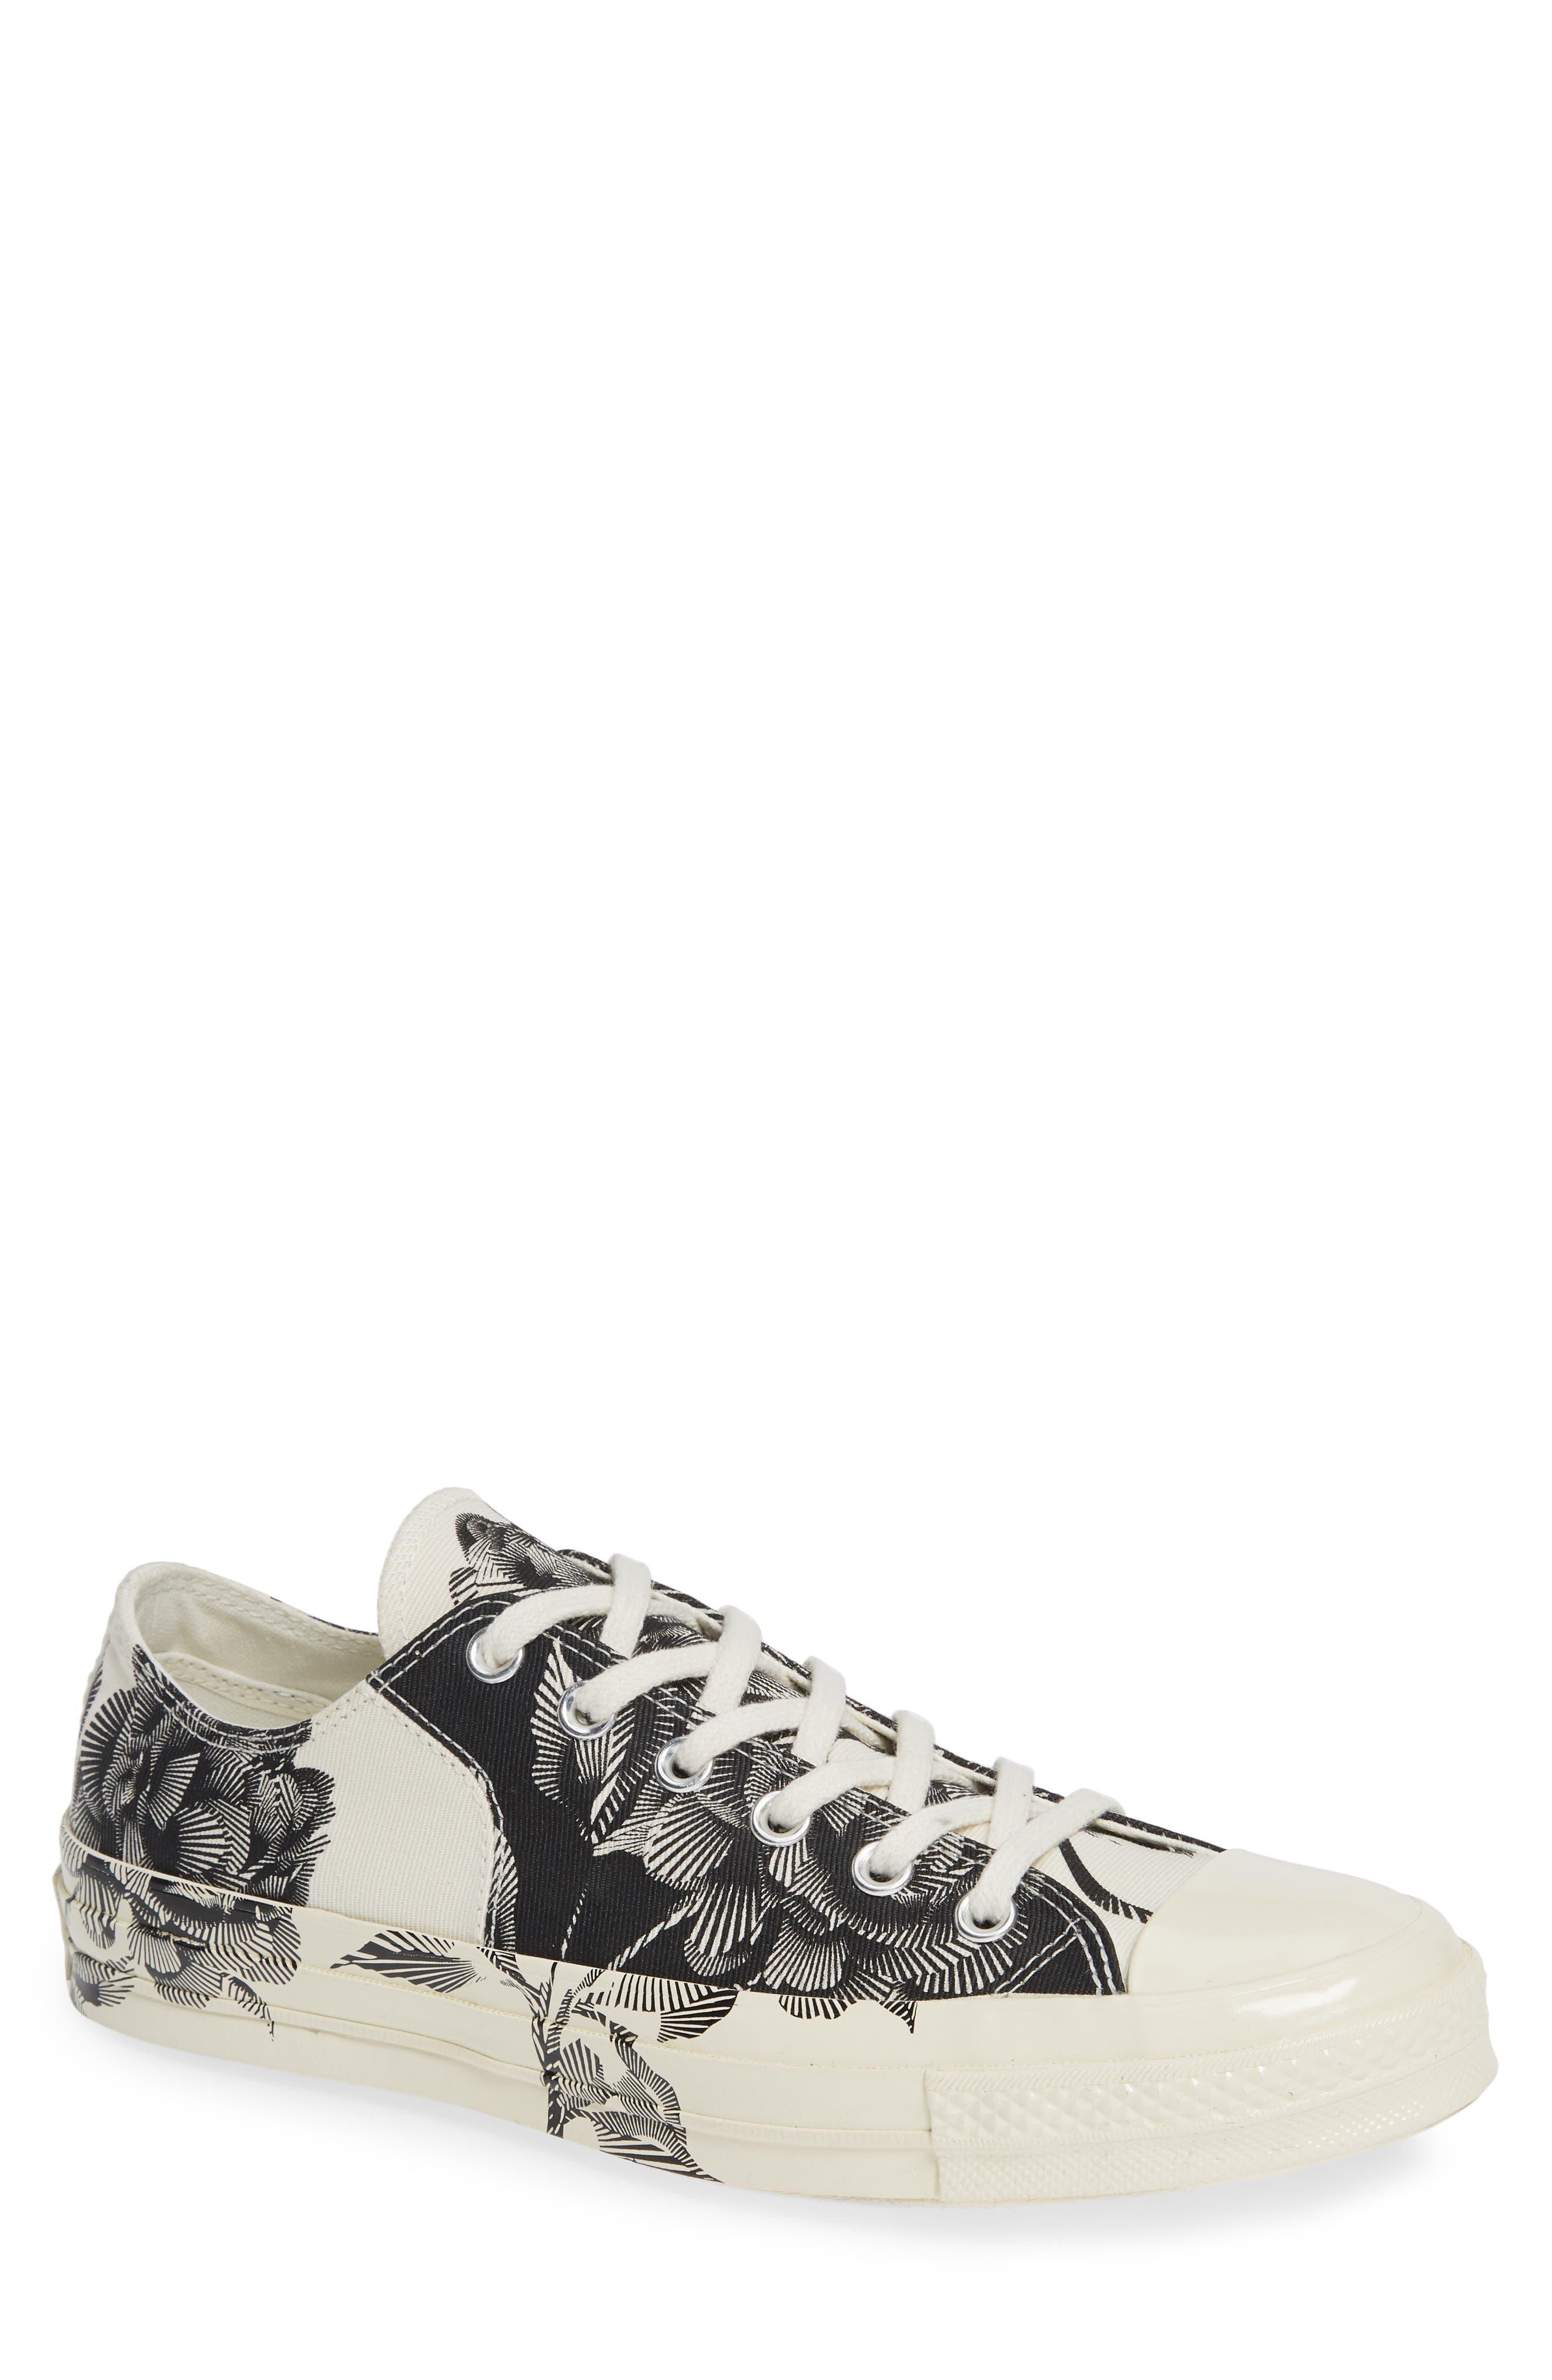 CT 70 Peony Low Top Sneaker,                         Main,                         color, 001